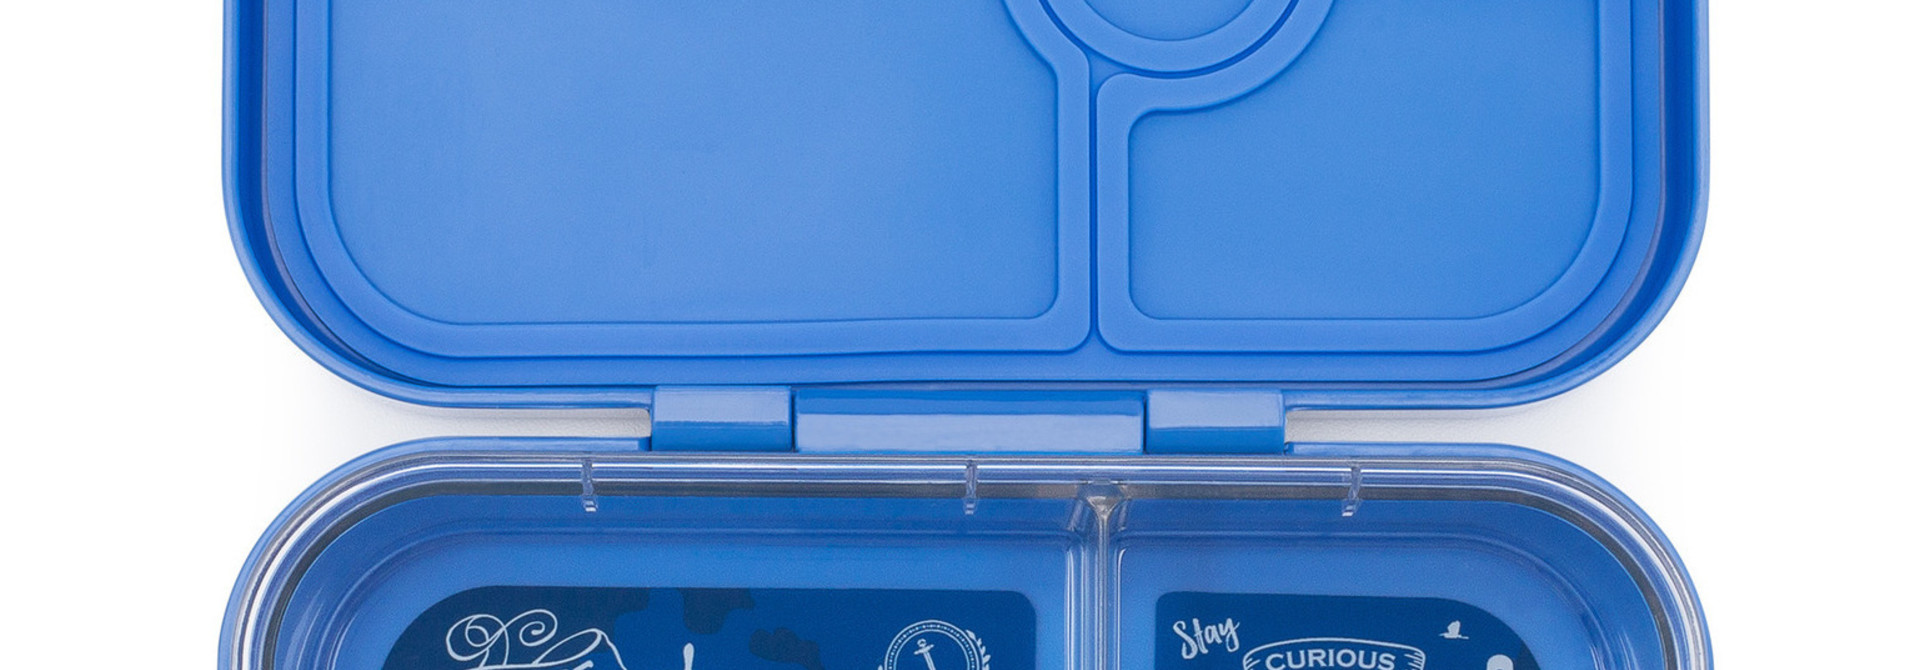 Yumbox Panino broodtrommel 4 vakken, Jodphur blauw / Explore tray